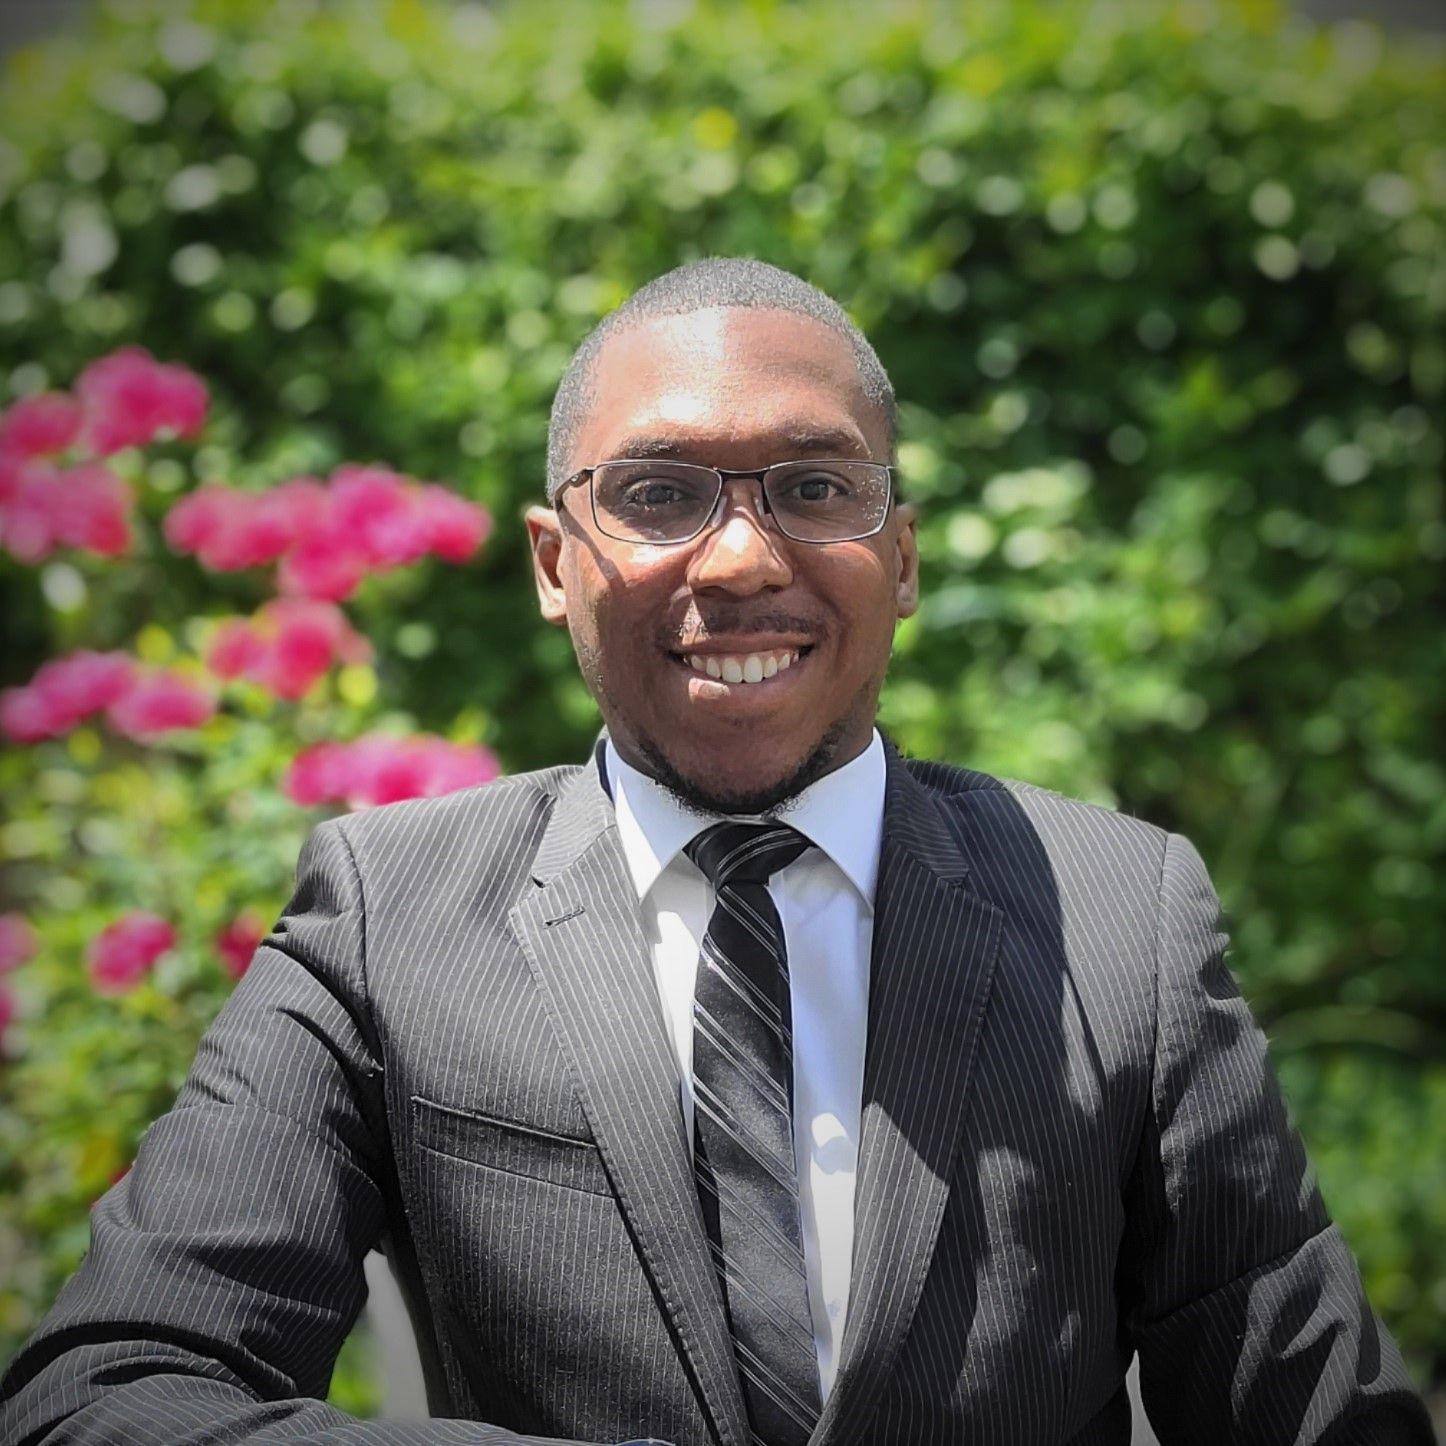 Demetrius Sudduth-Peterson